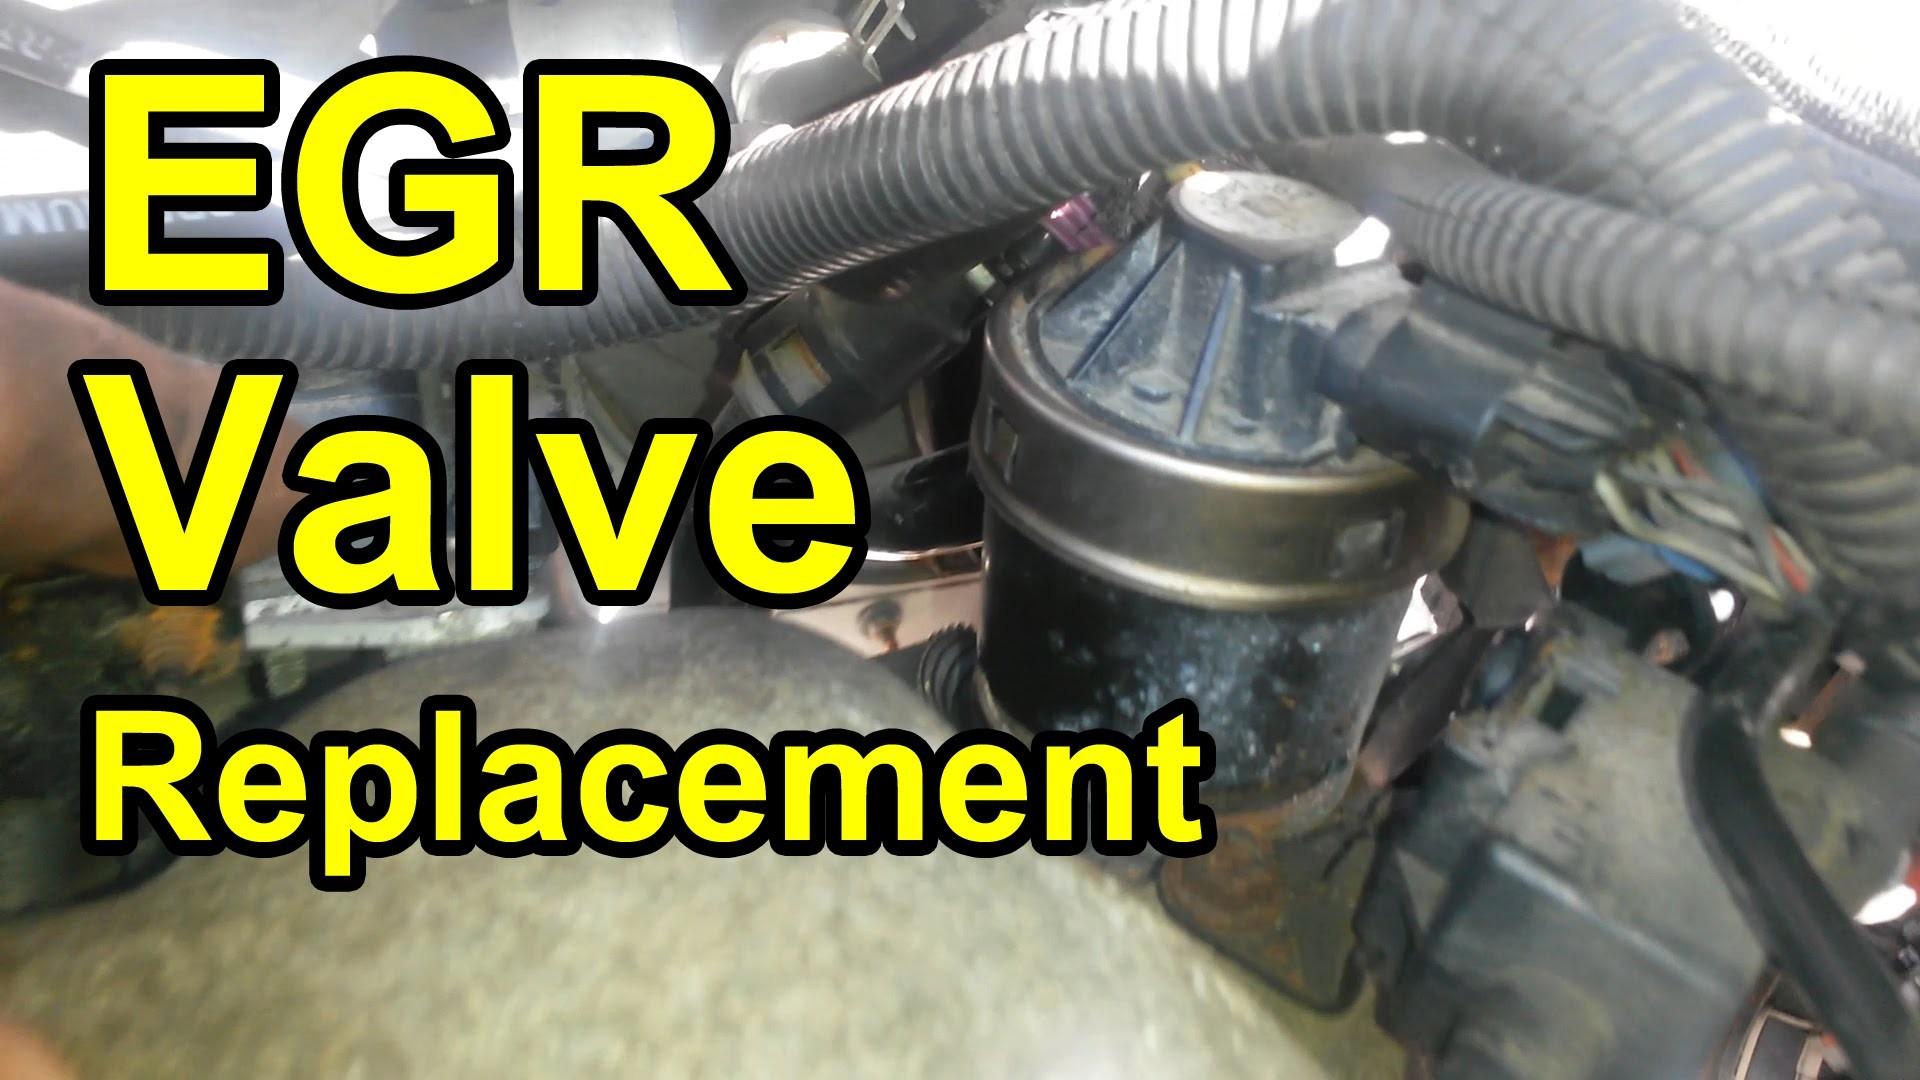 4l Engine Diagram 3 Worksheet And Wiring Gm 4 L 2003 Chevy Venture Egr Valve Replacement Rh Detoxicrecenze Com 34l 31 V6